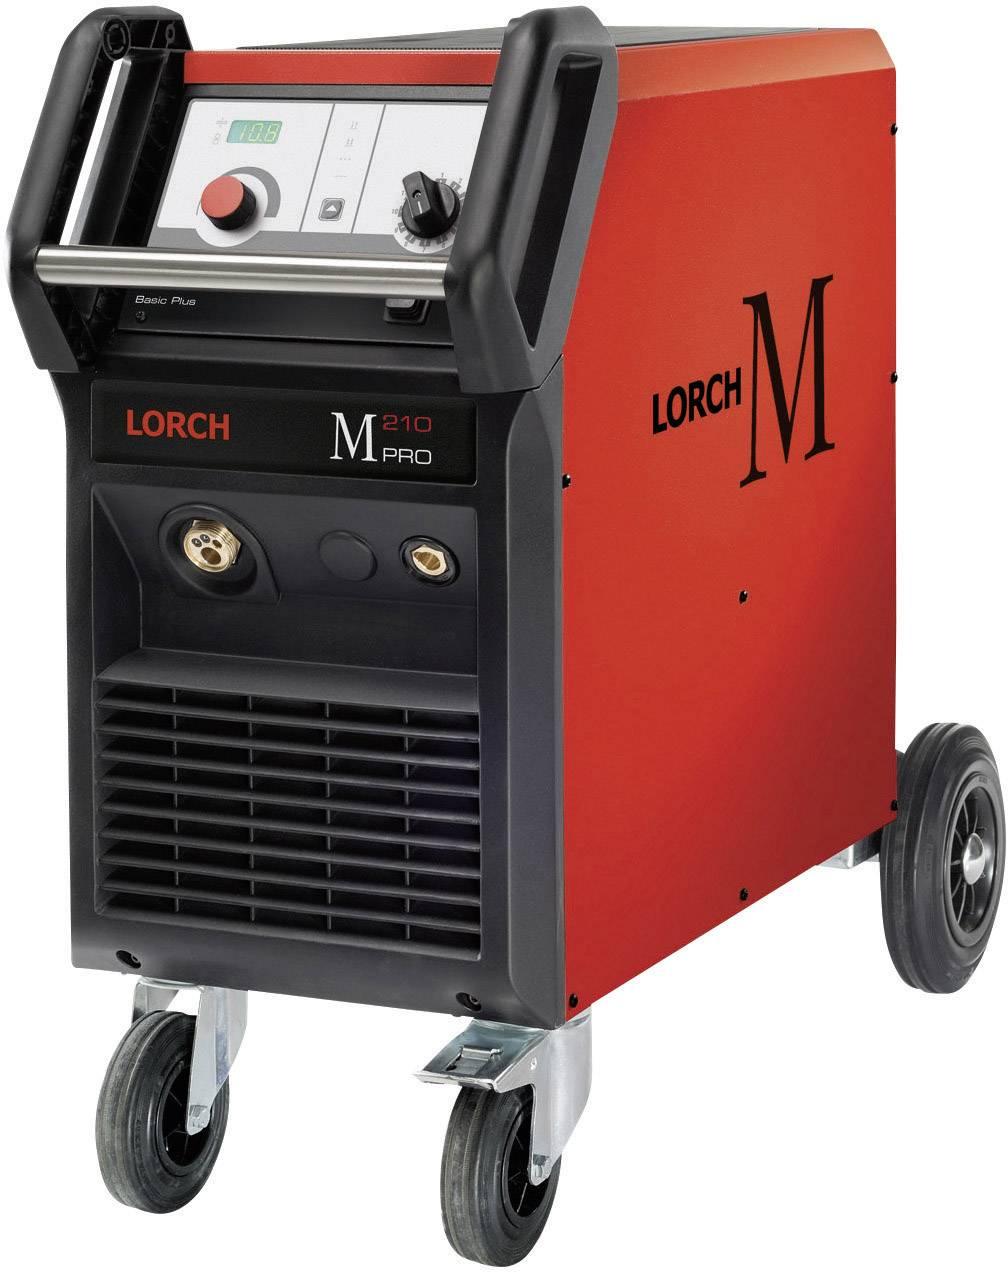 MIG / MAG svářečka Lorch 218.0210.1, 25 - 210 A, s hořákem